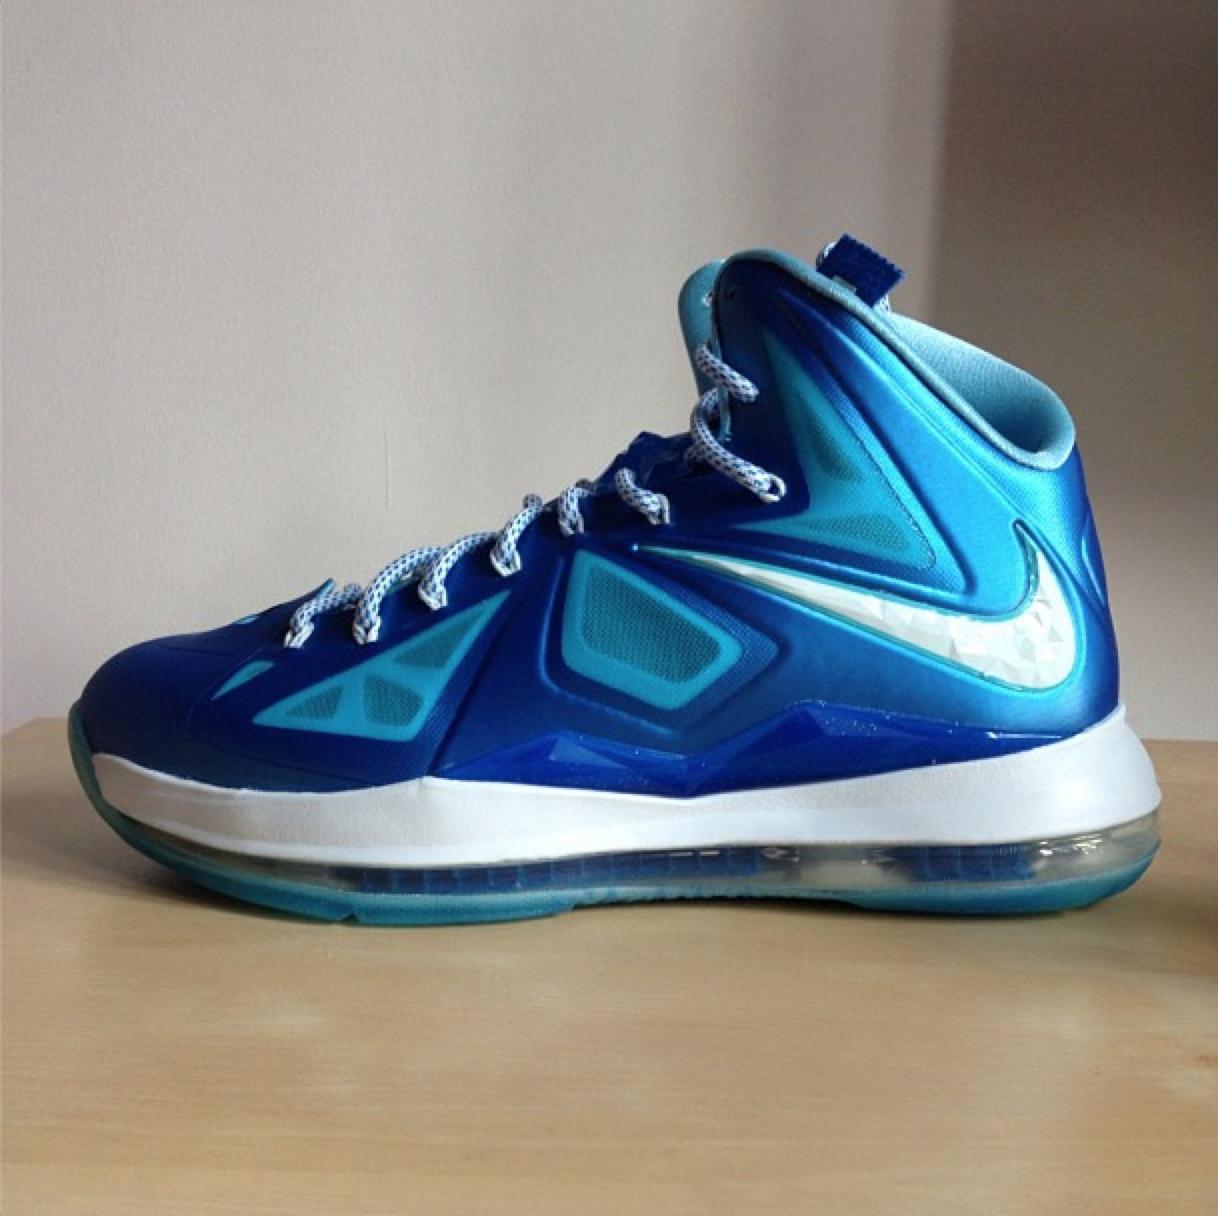 Nike LeBron X+ 'Blue Diamond' - Release Date + Info